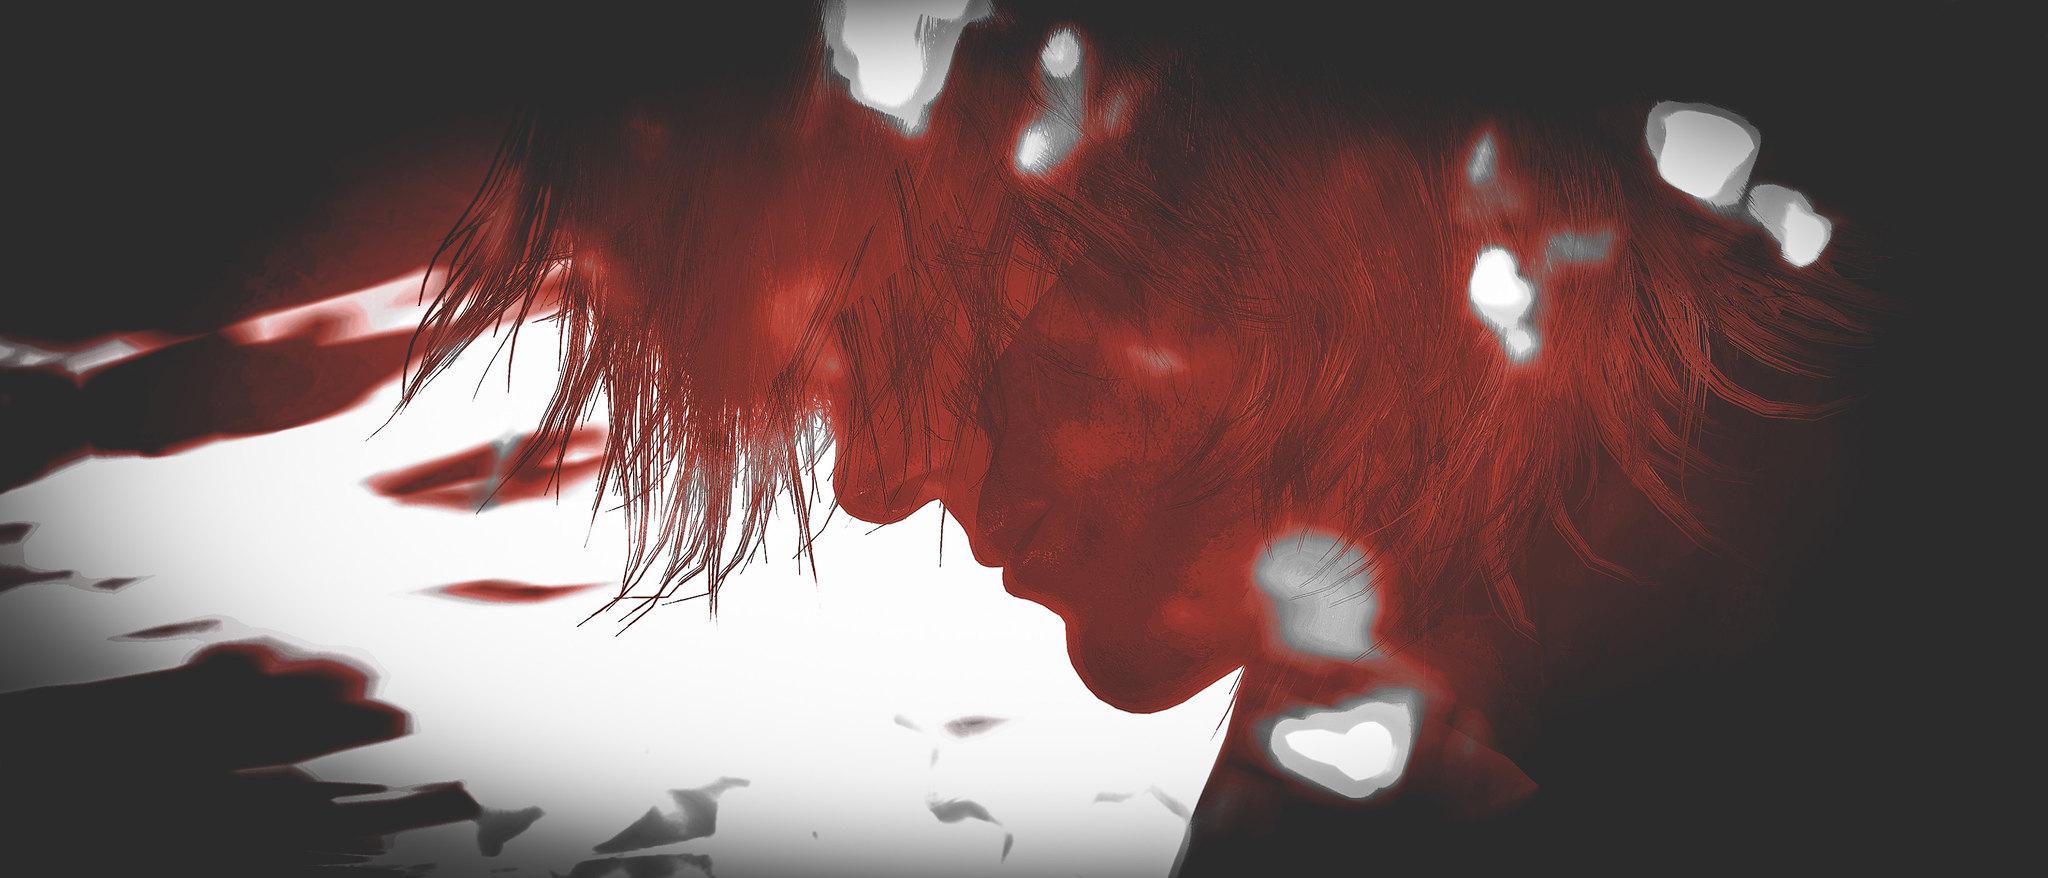 48878479468_c0f8298215_k.jpg - Devil May Cry 5